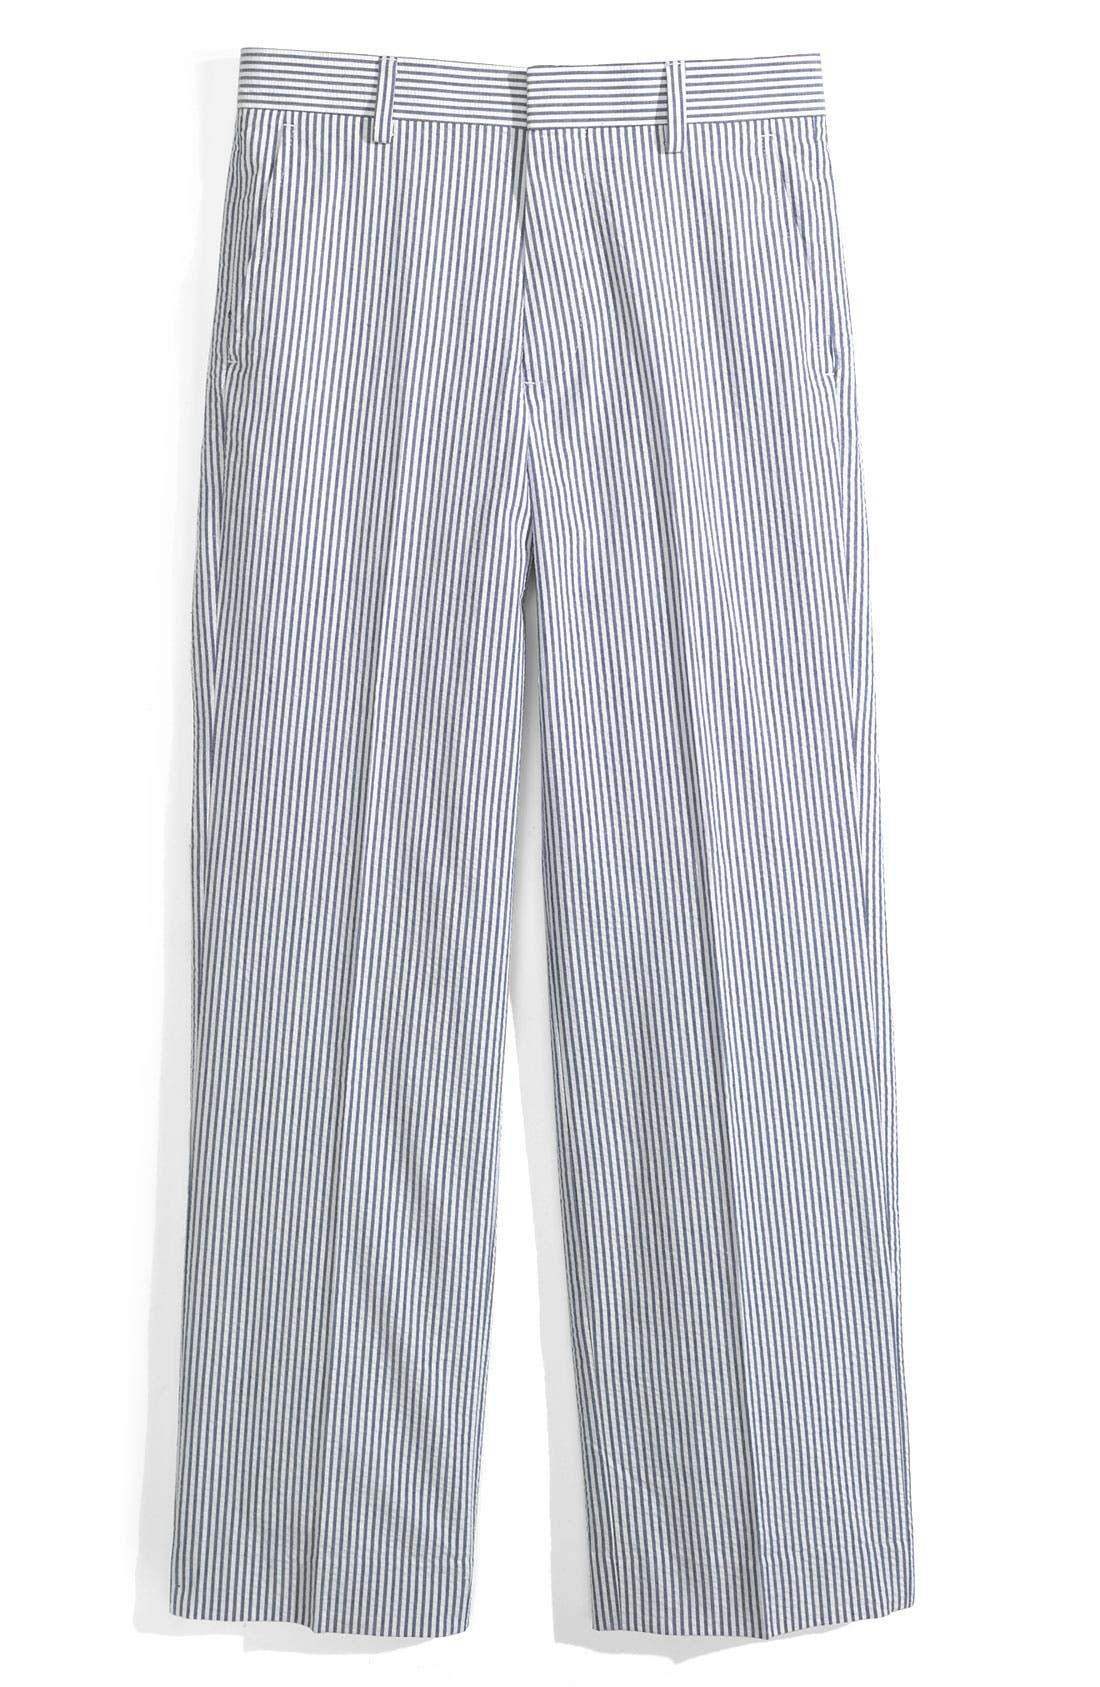 Alternate Image 1 Selected - Nordstrom Seersucker Pants (Little Boys & Big Boys)